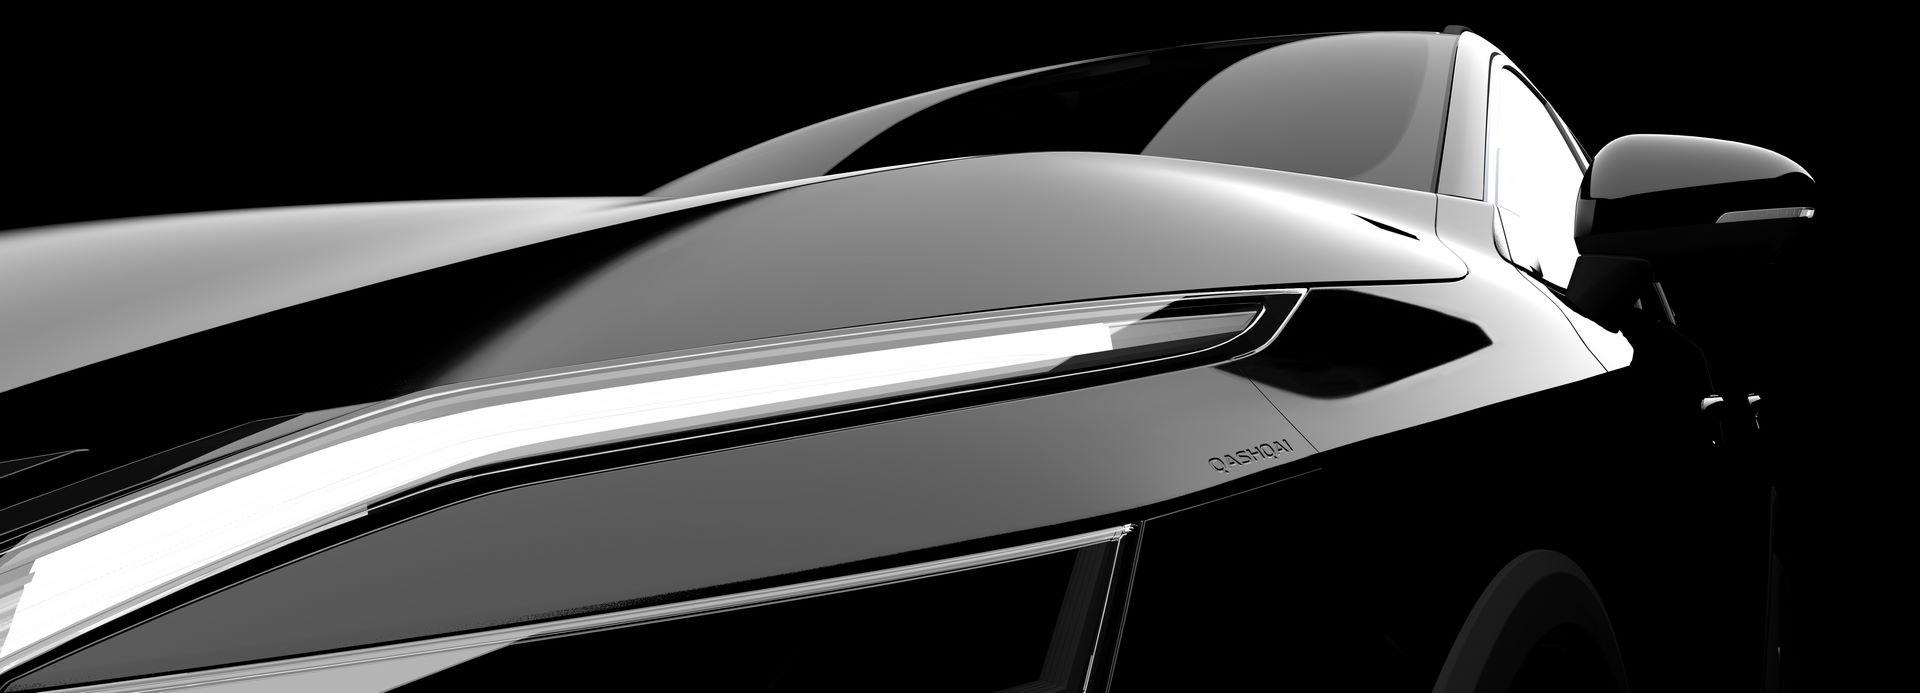 Autodesk VRED Professional 2020.1